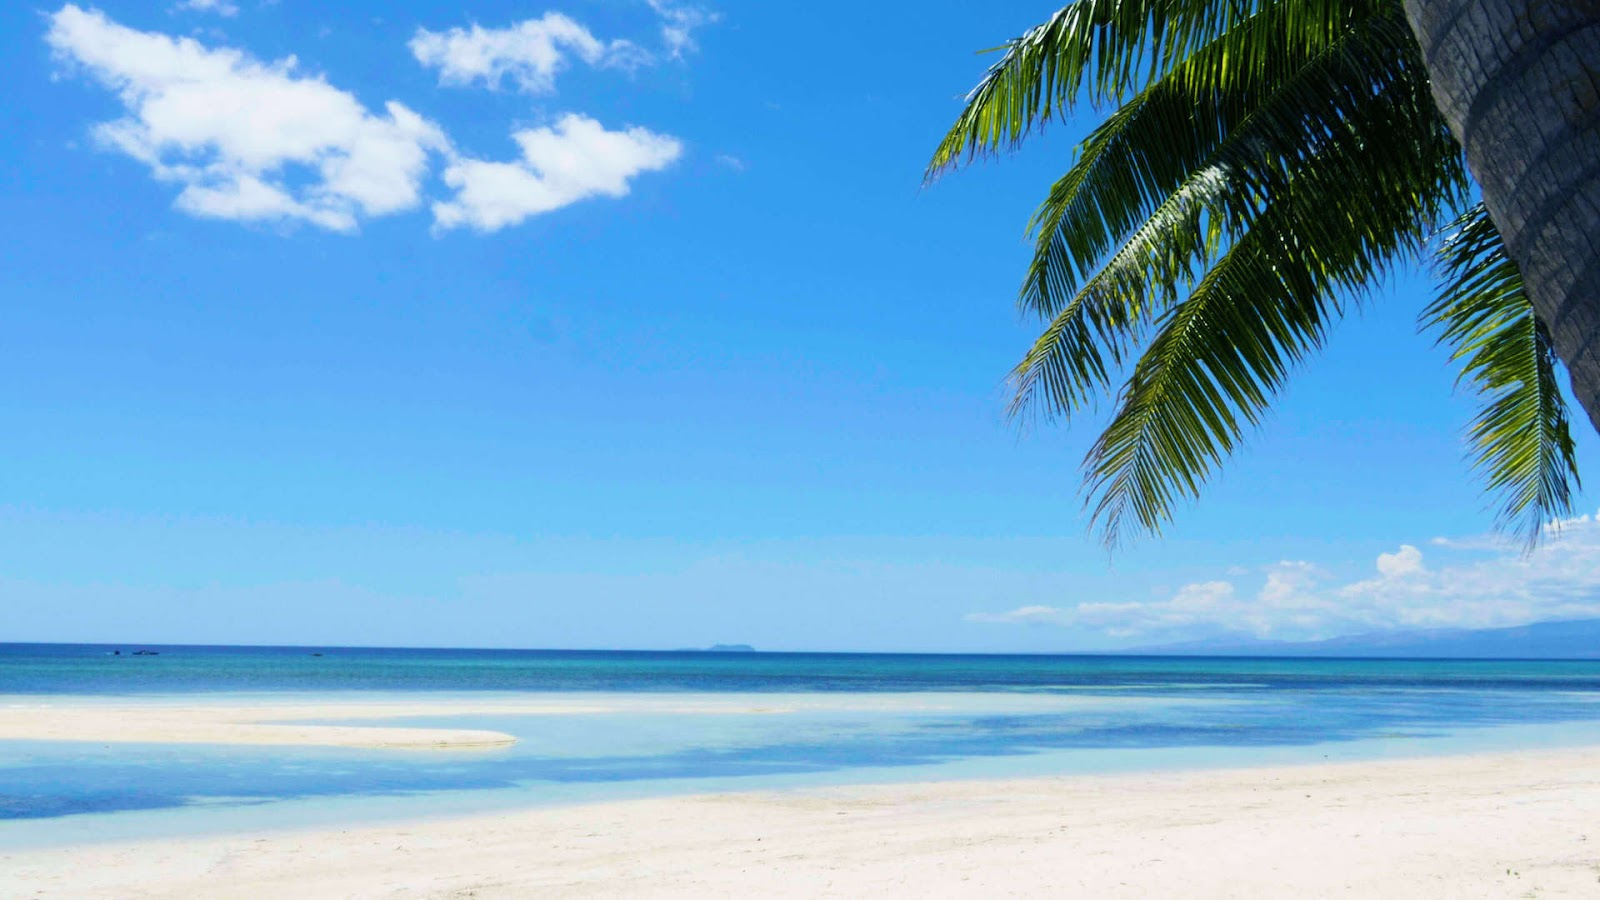 Free Tropical Beach Wallpapers For Desktop Enam Wallpaper